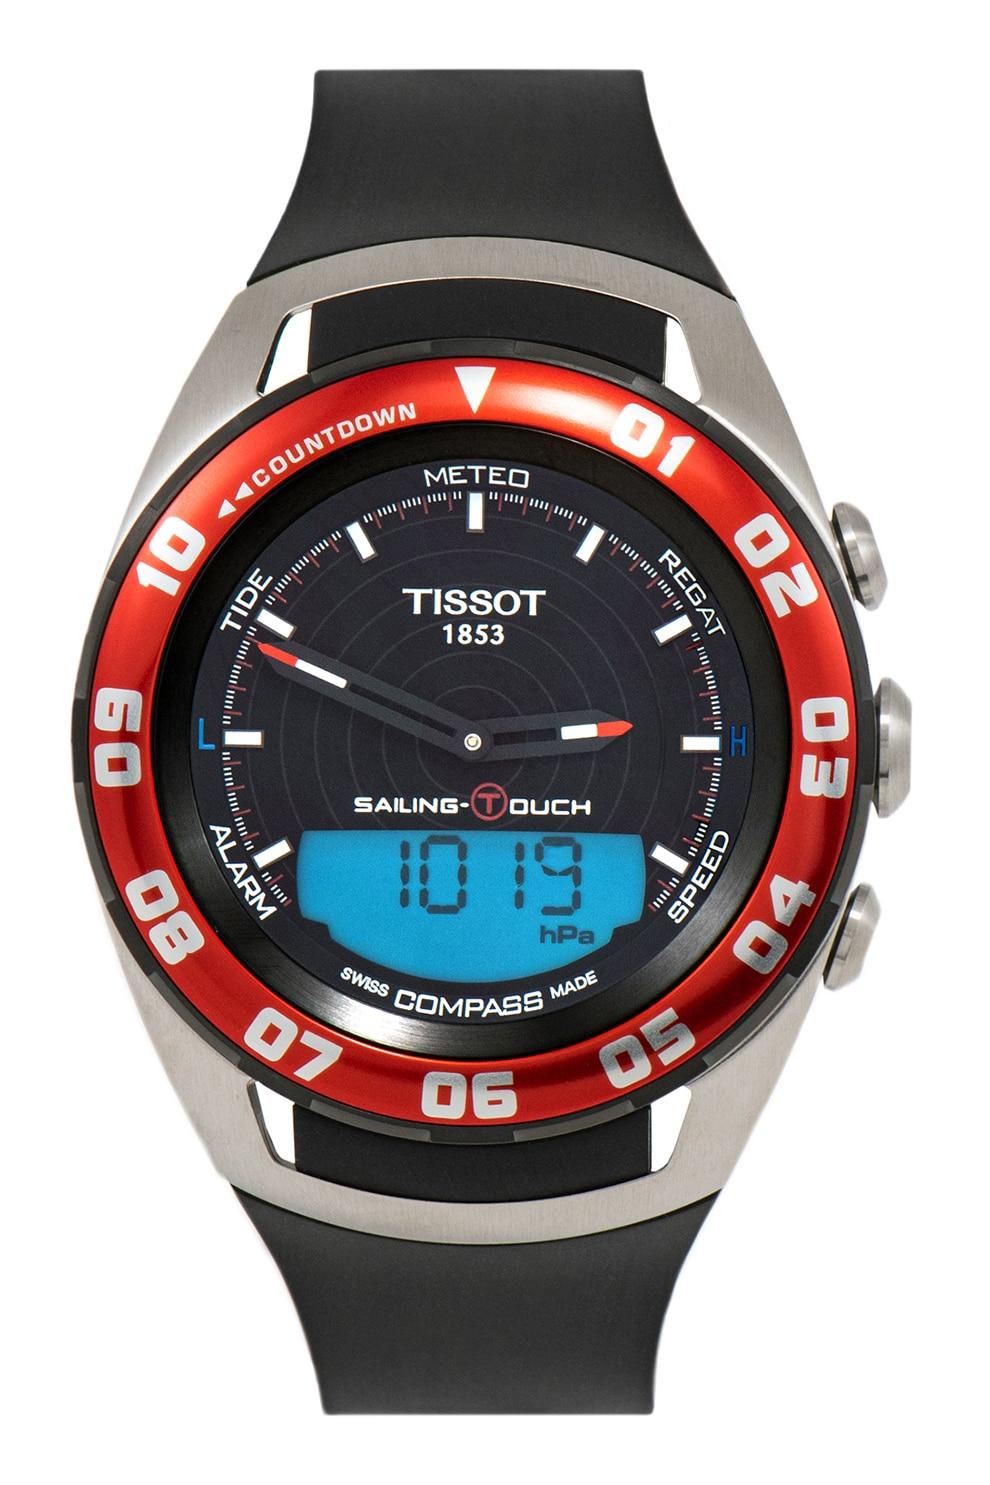 Fotografie Tissot, Ceas analog-digital cu o curea de silicon T-Touch, Negru/argintiu/rosu